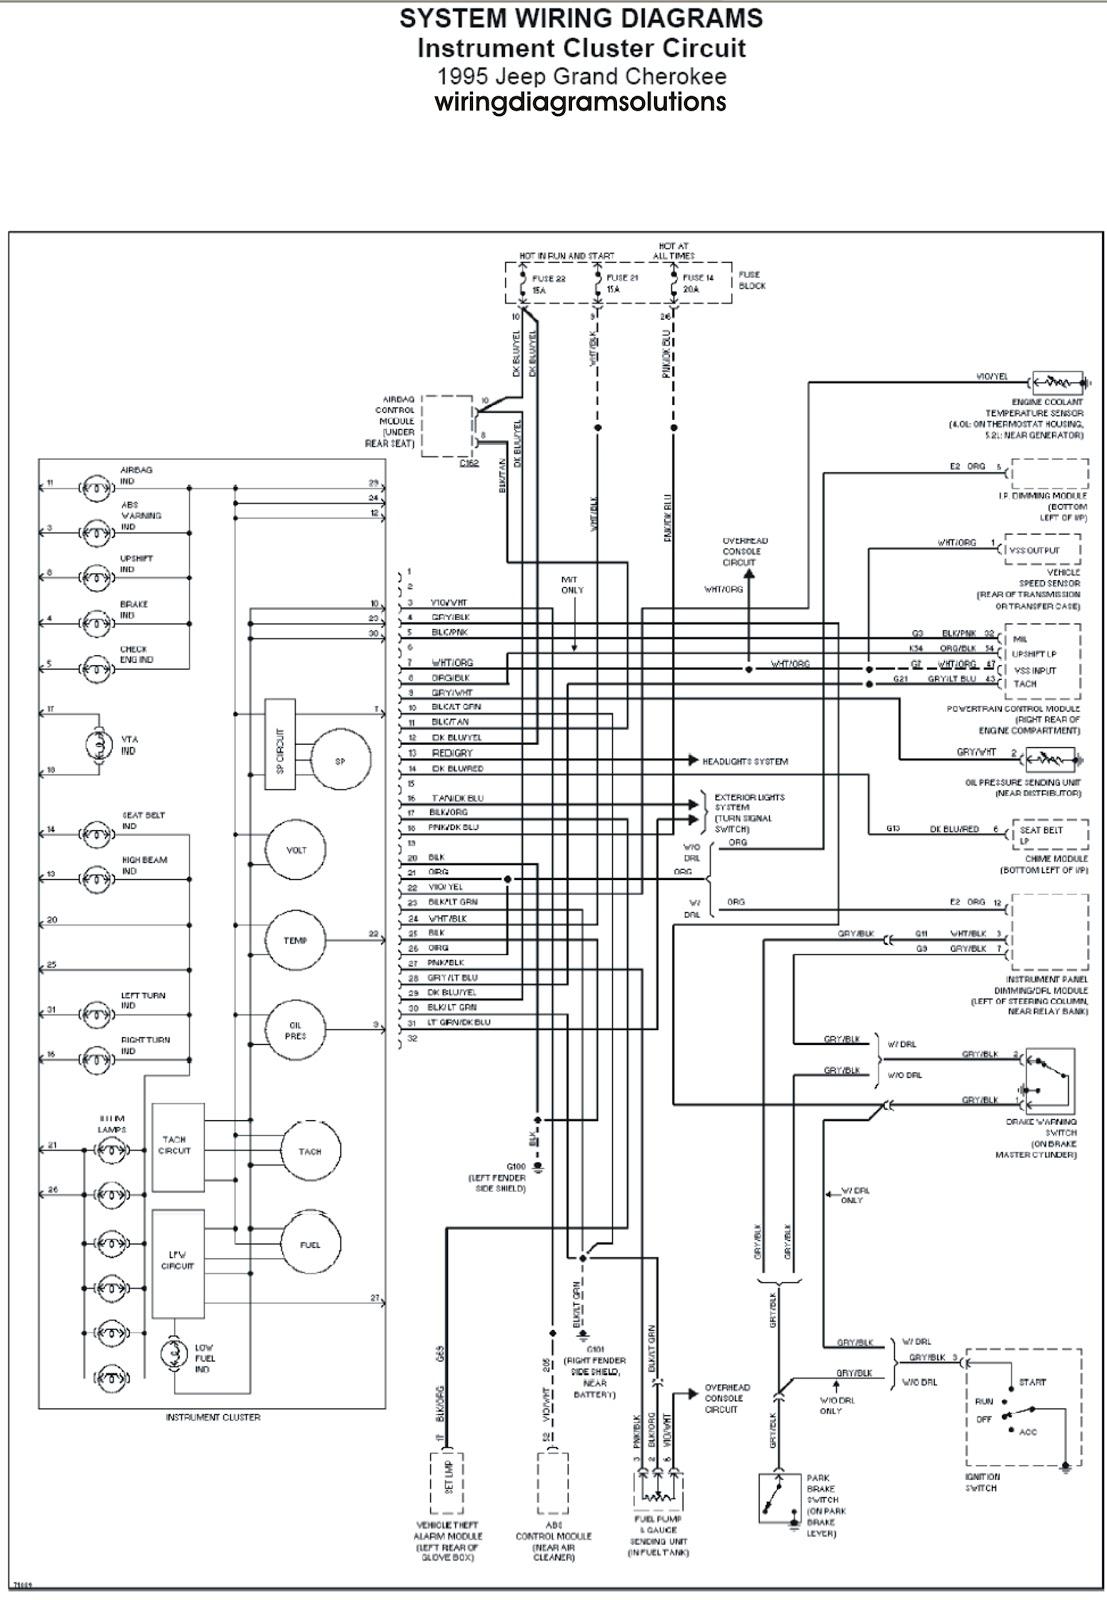 Remarkable Cj Speedometer Cluster Wiring Diagram Wiring Diagram Wiring Cloud Itislusmarecoveryedborg